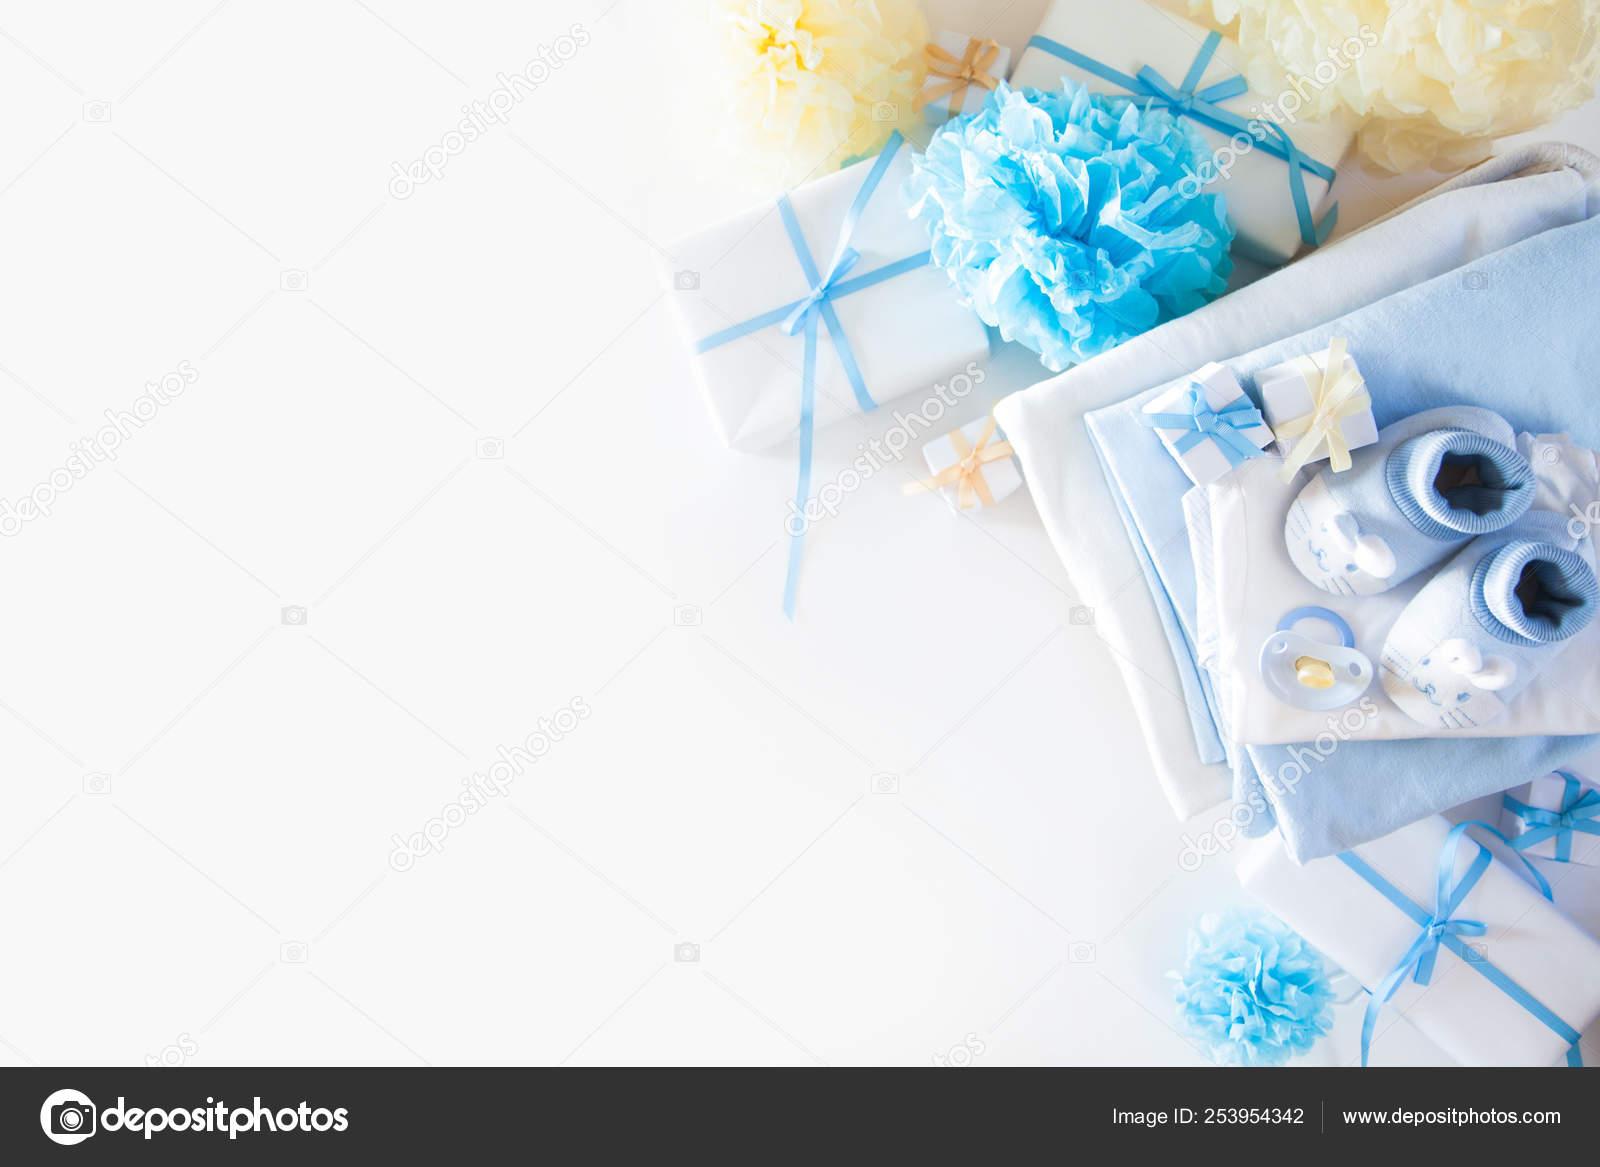 Its A Boy Blue Theme Baby Shower Or Nursery Background With Dec Stock Photo C Dalivl Yandex Ru 253954342